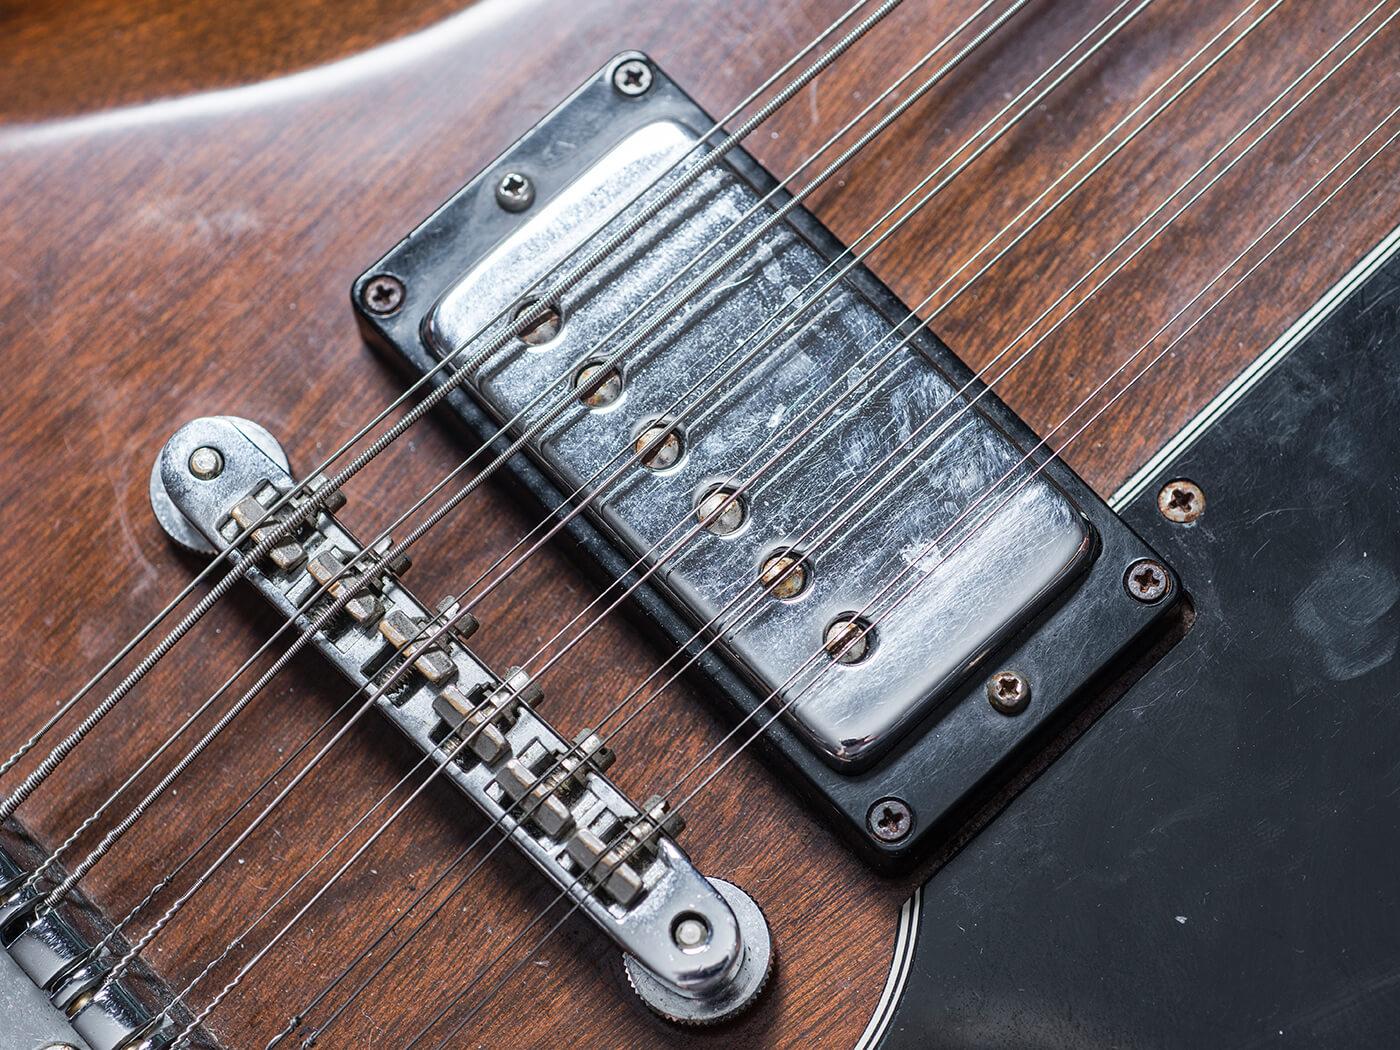 Scott holiday's Gibson EDS-1275 doubleneck